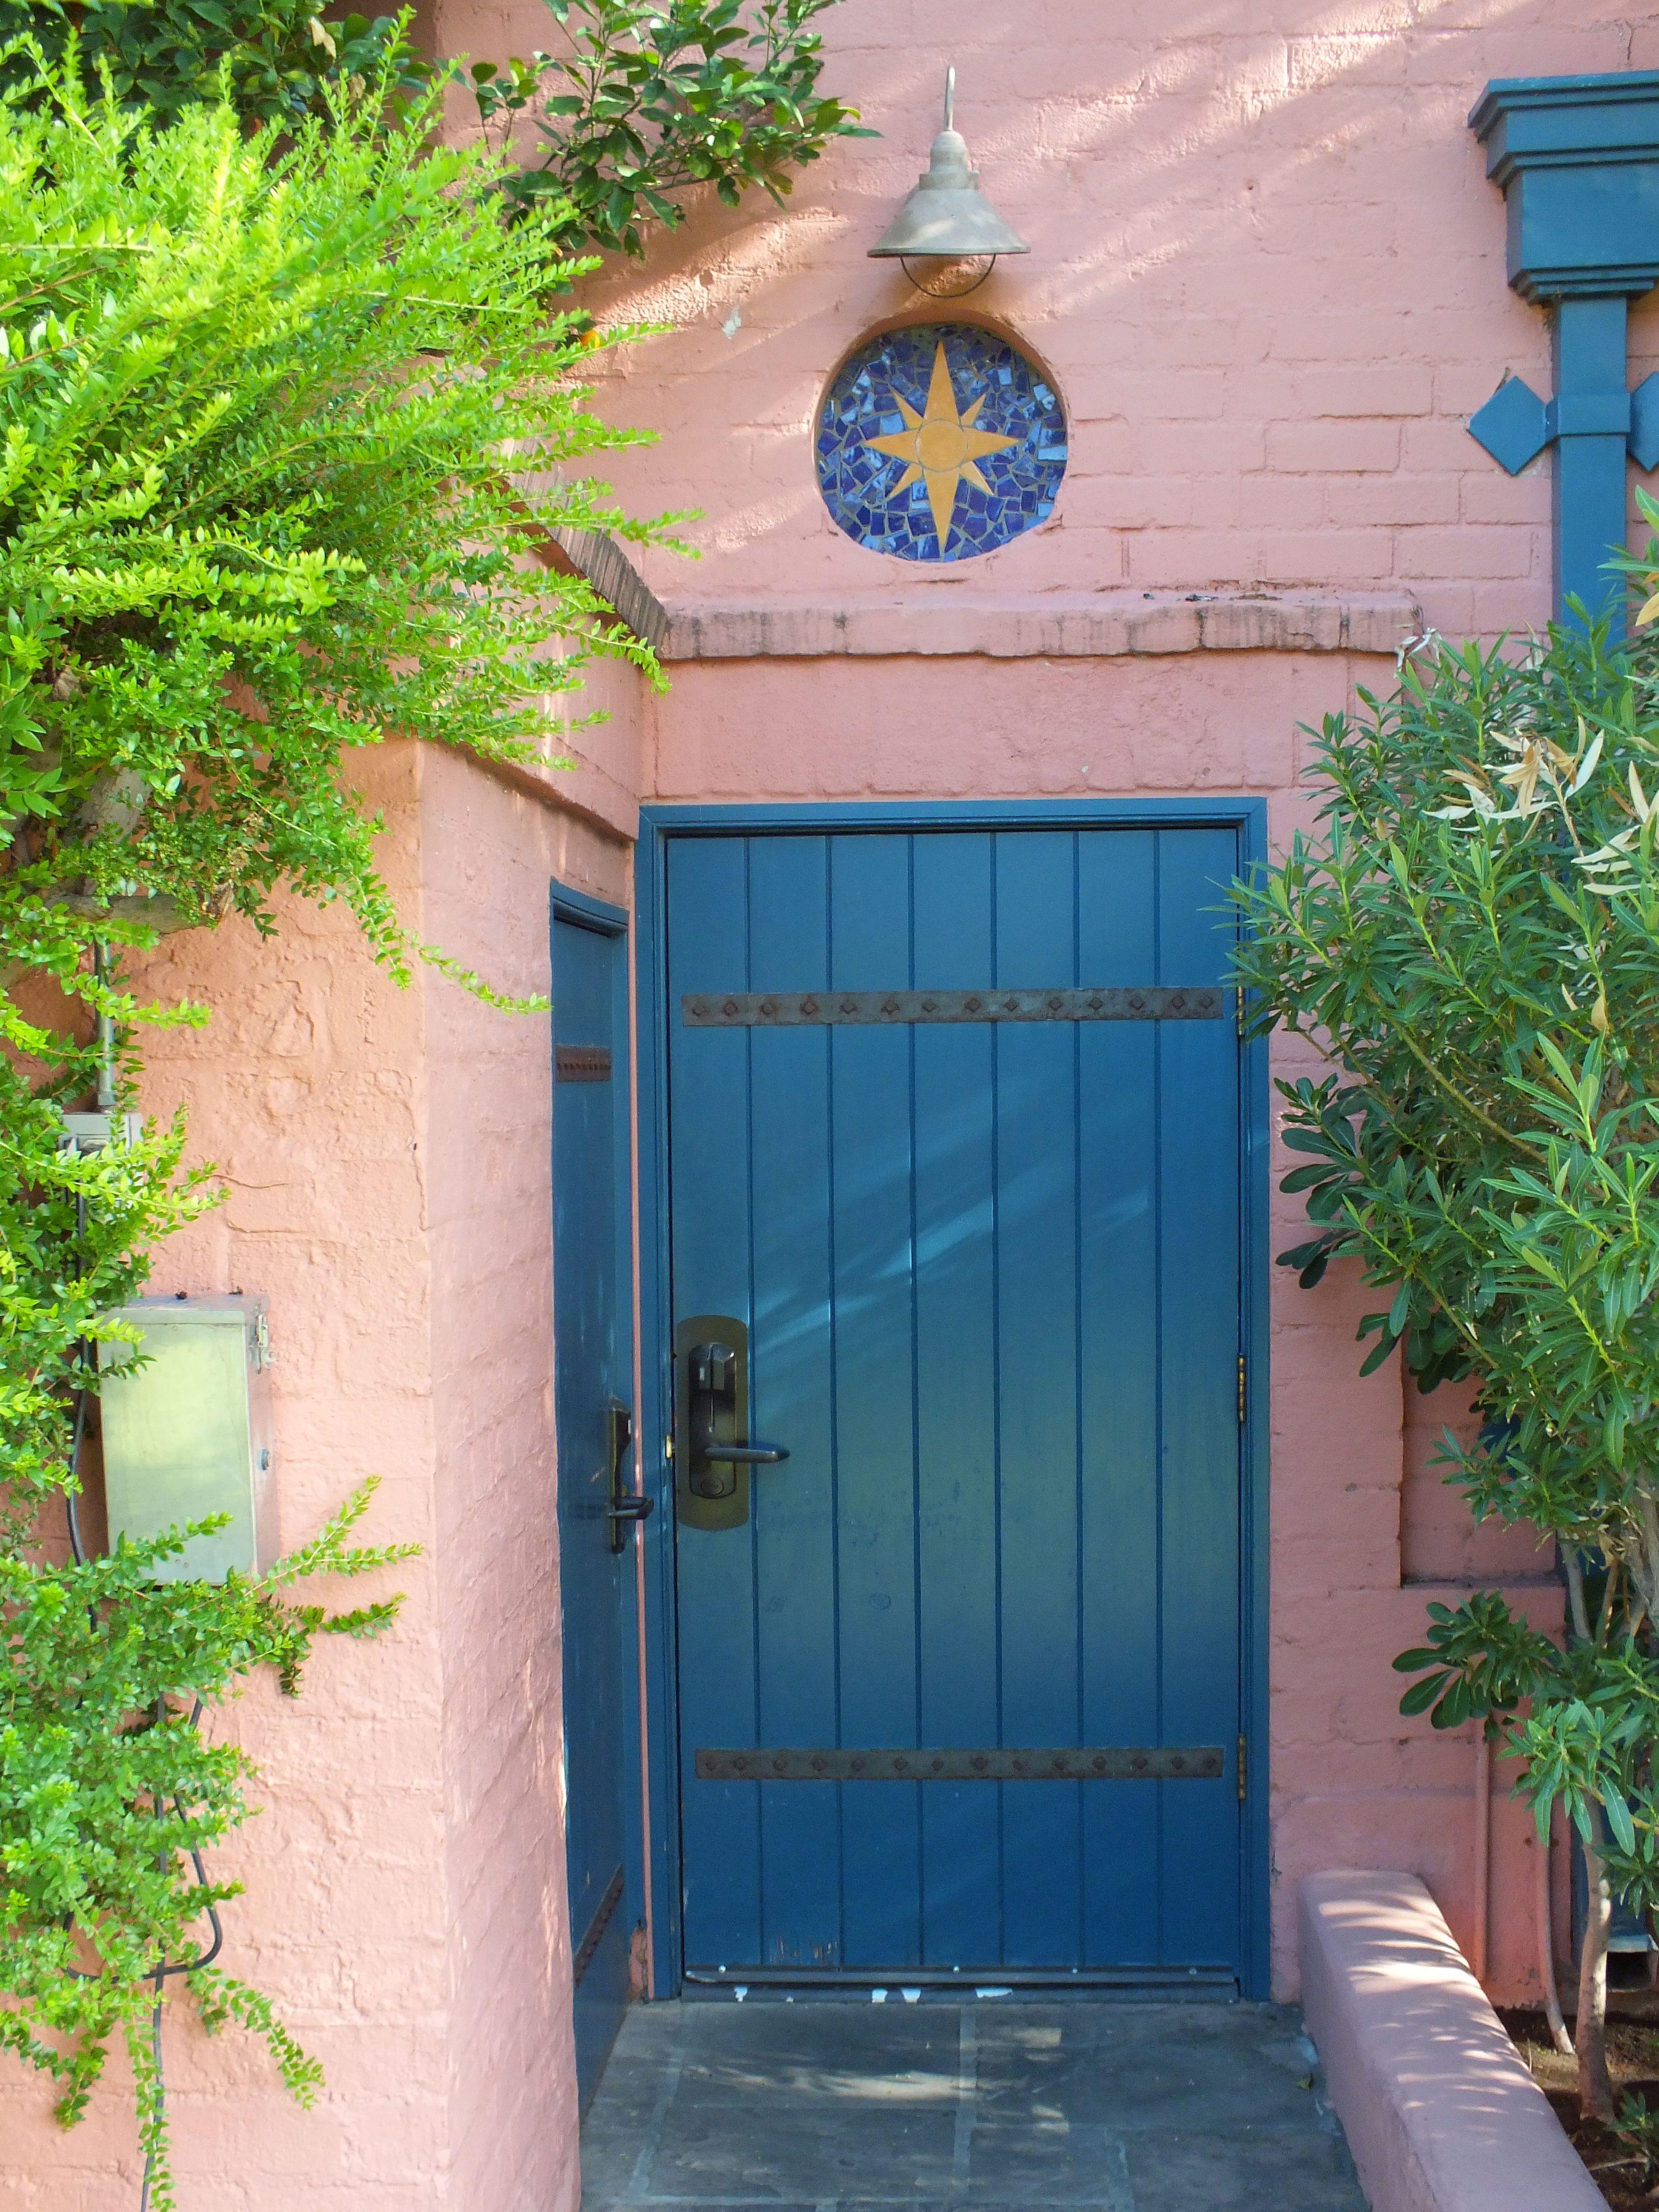 Charming star, Arizona Inn, Tucson